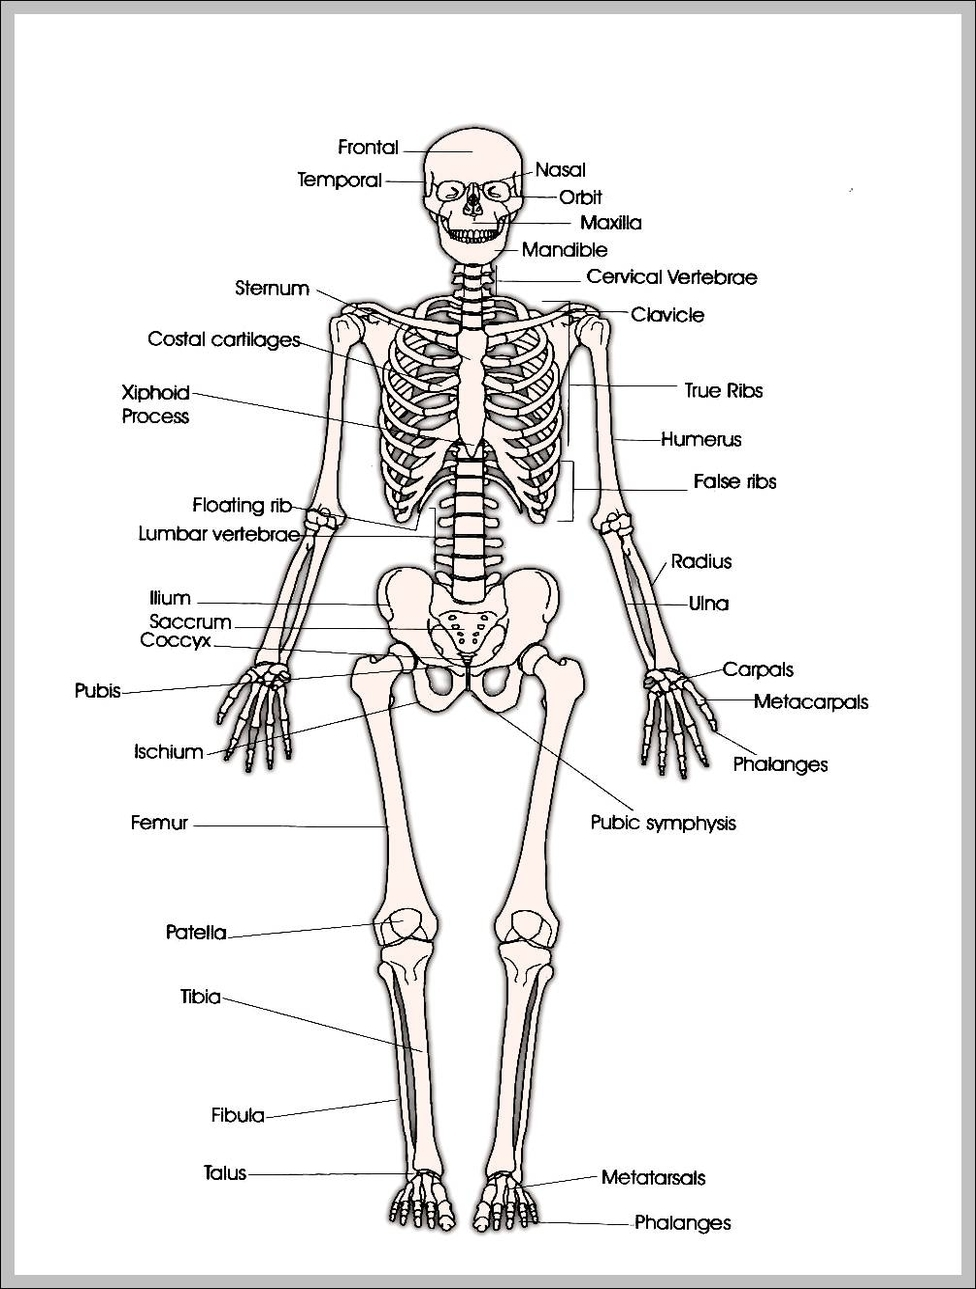 medium resolution of human skeleton anatomy anatomy system human body anatomy diagramprintable human skeleton diagram printable human skeleton chart